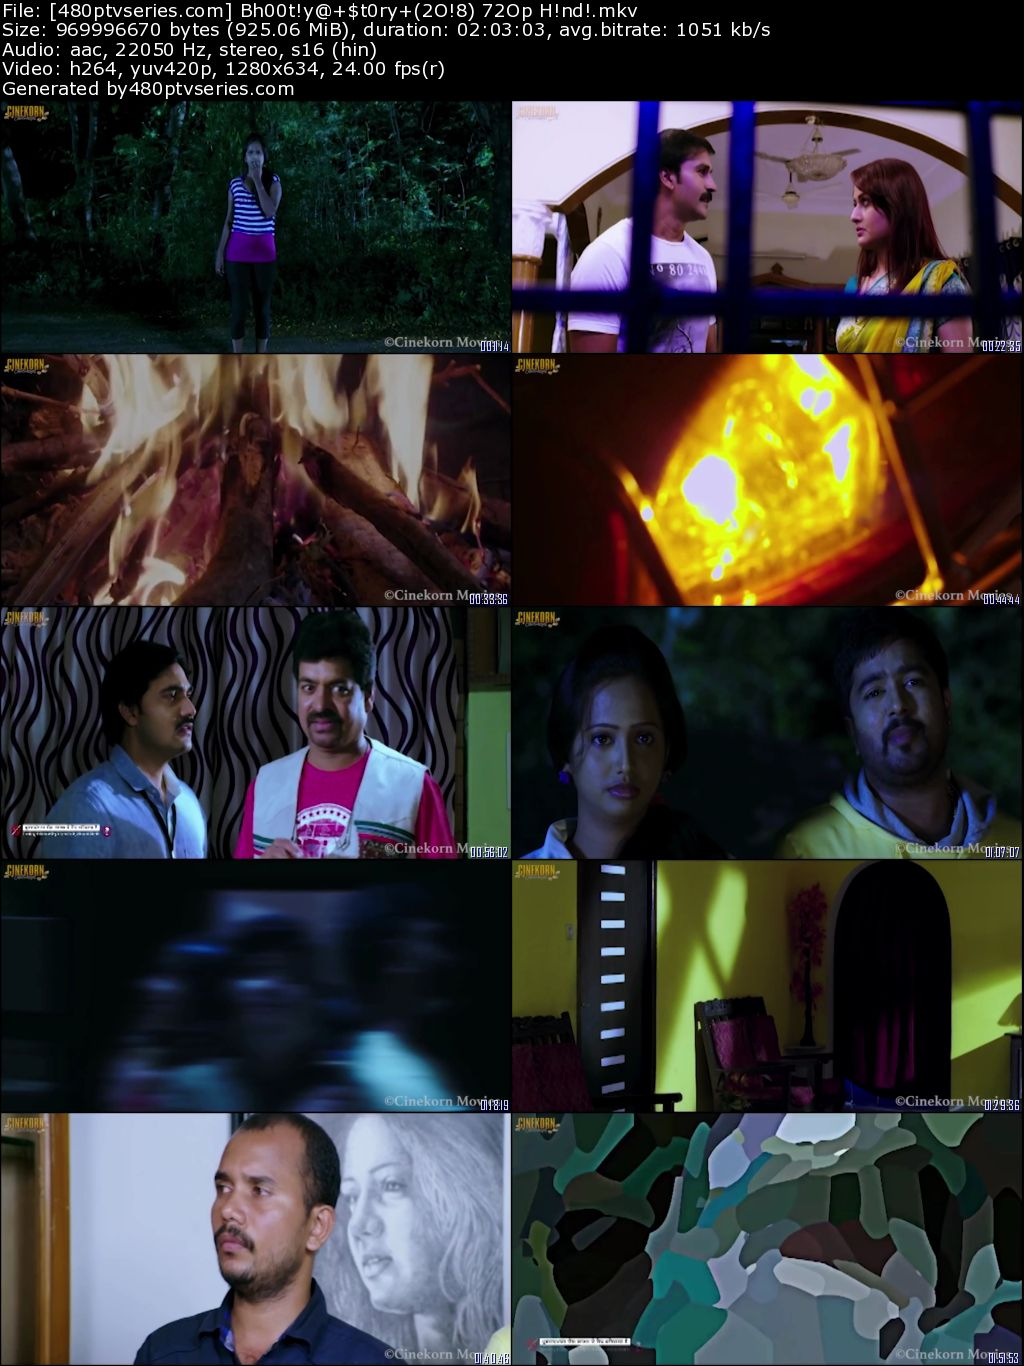 Download Bhootiya Story (2018) 900MB Full Hindi Dubbed Movie Download 720p HDRip Free Watch Online Full Movie Download Worldfree4u 9xmovies